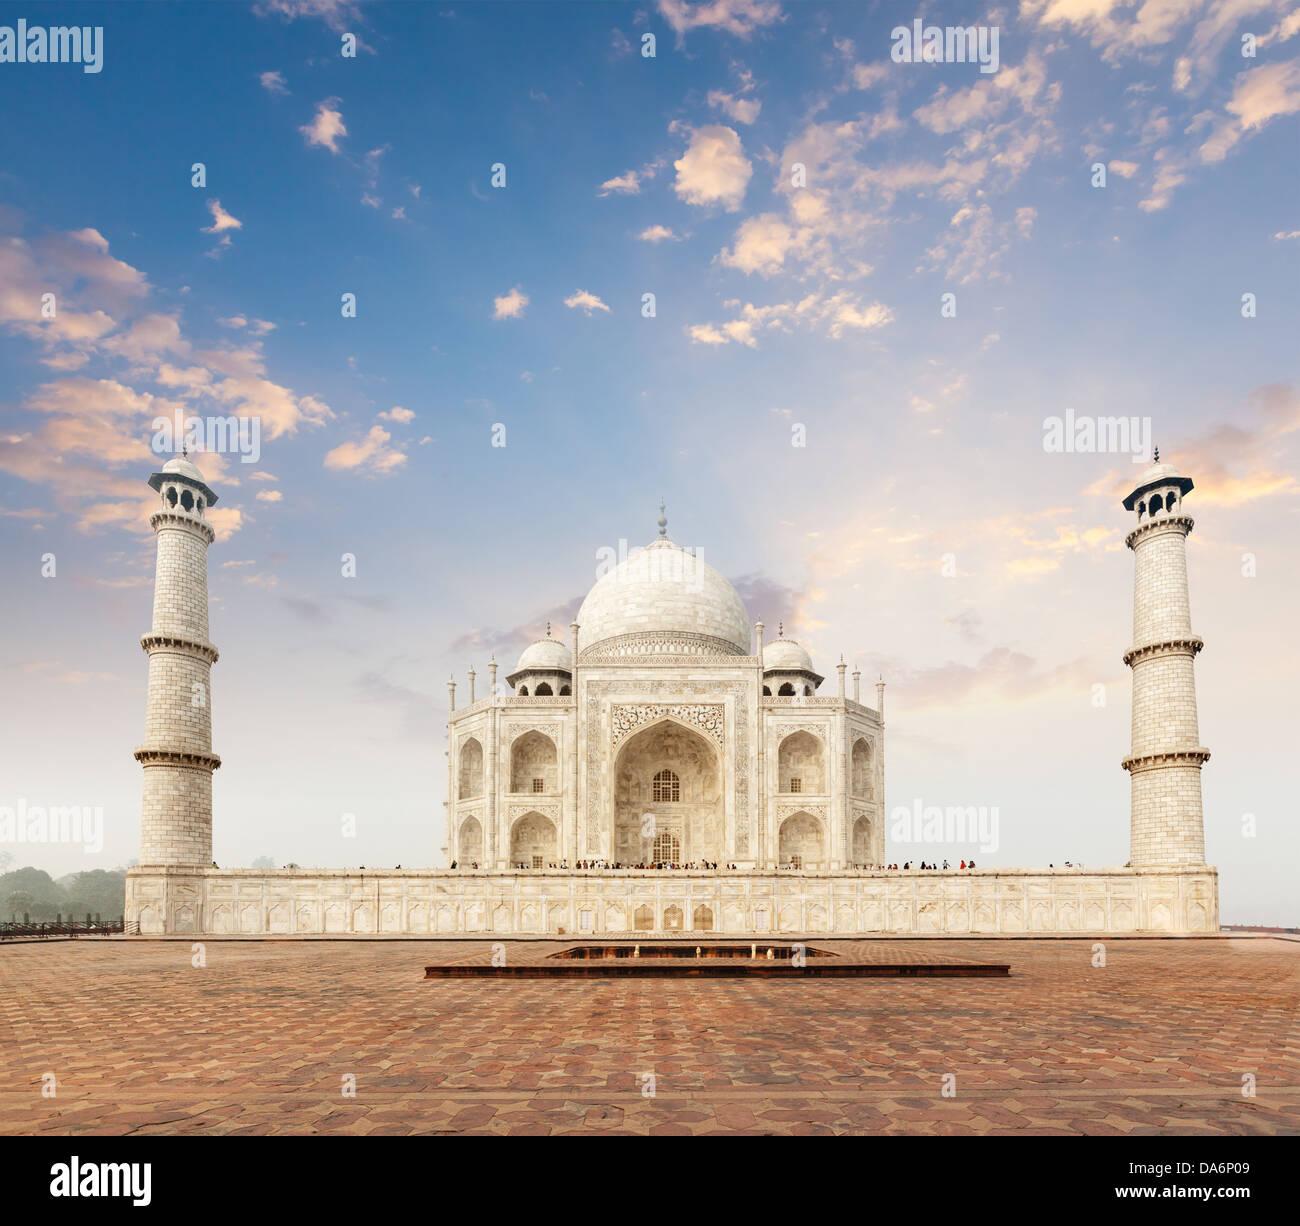 Taj Mahal. Indian Symbol - India travel background. Agra, India - Stock Image